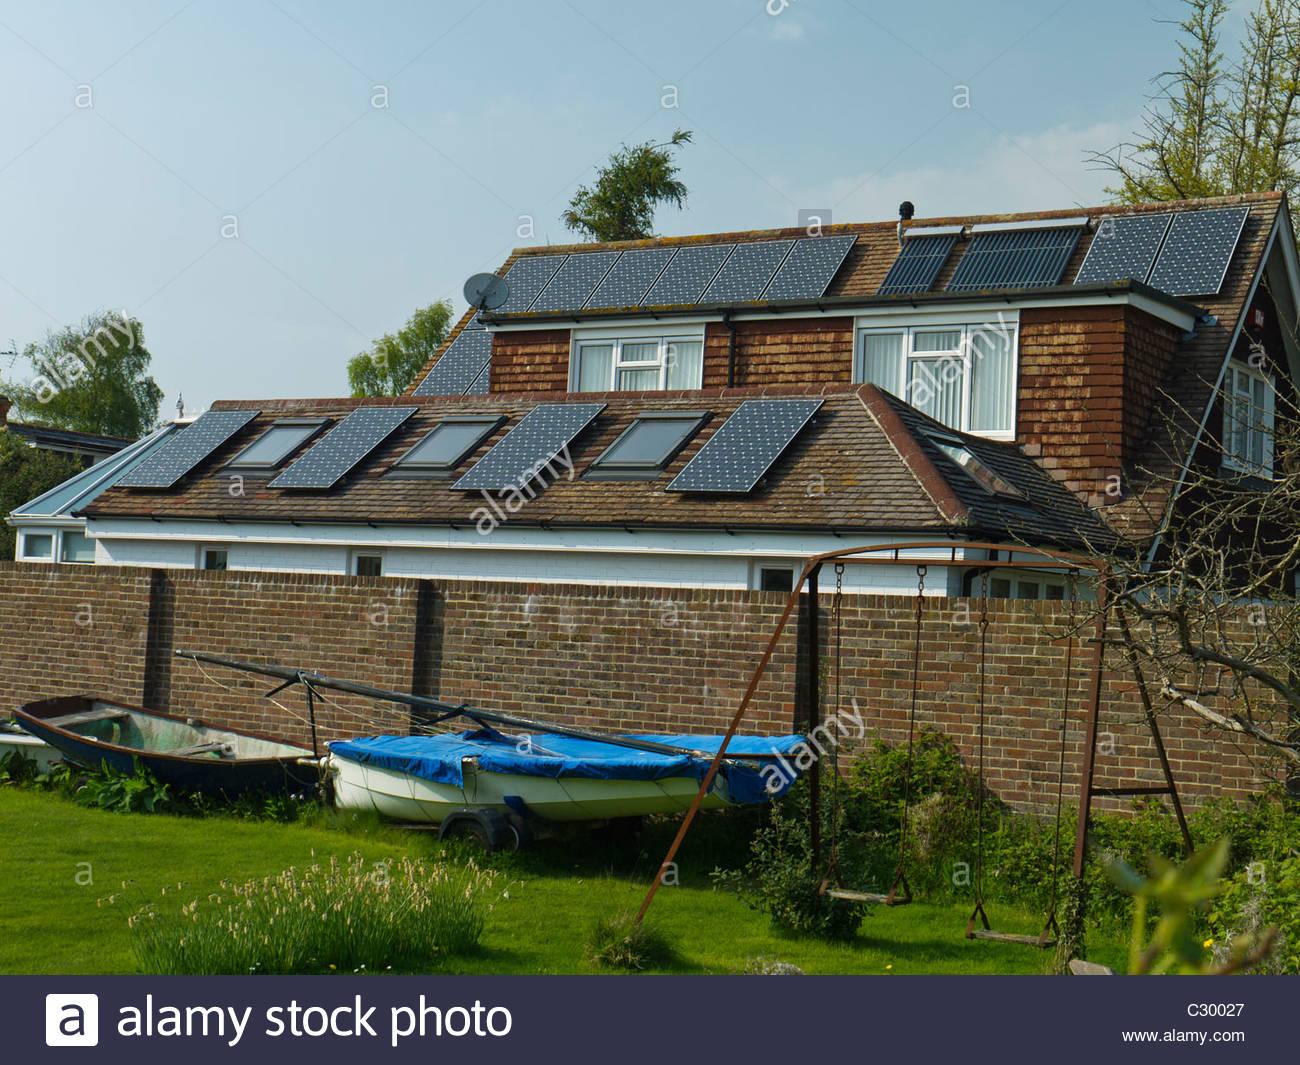 England ,UK Hampshire Solar Panels on House Roof Energy Power Electricity Hot Water - Stock Image